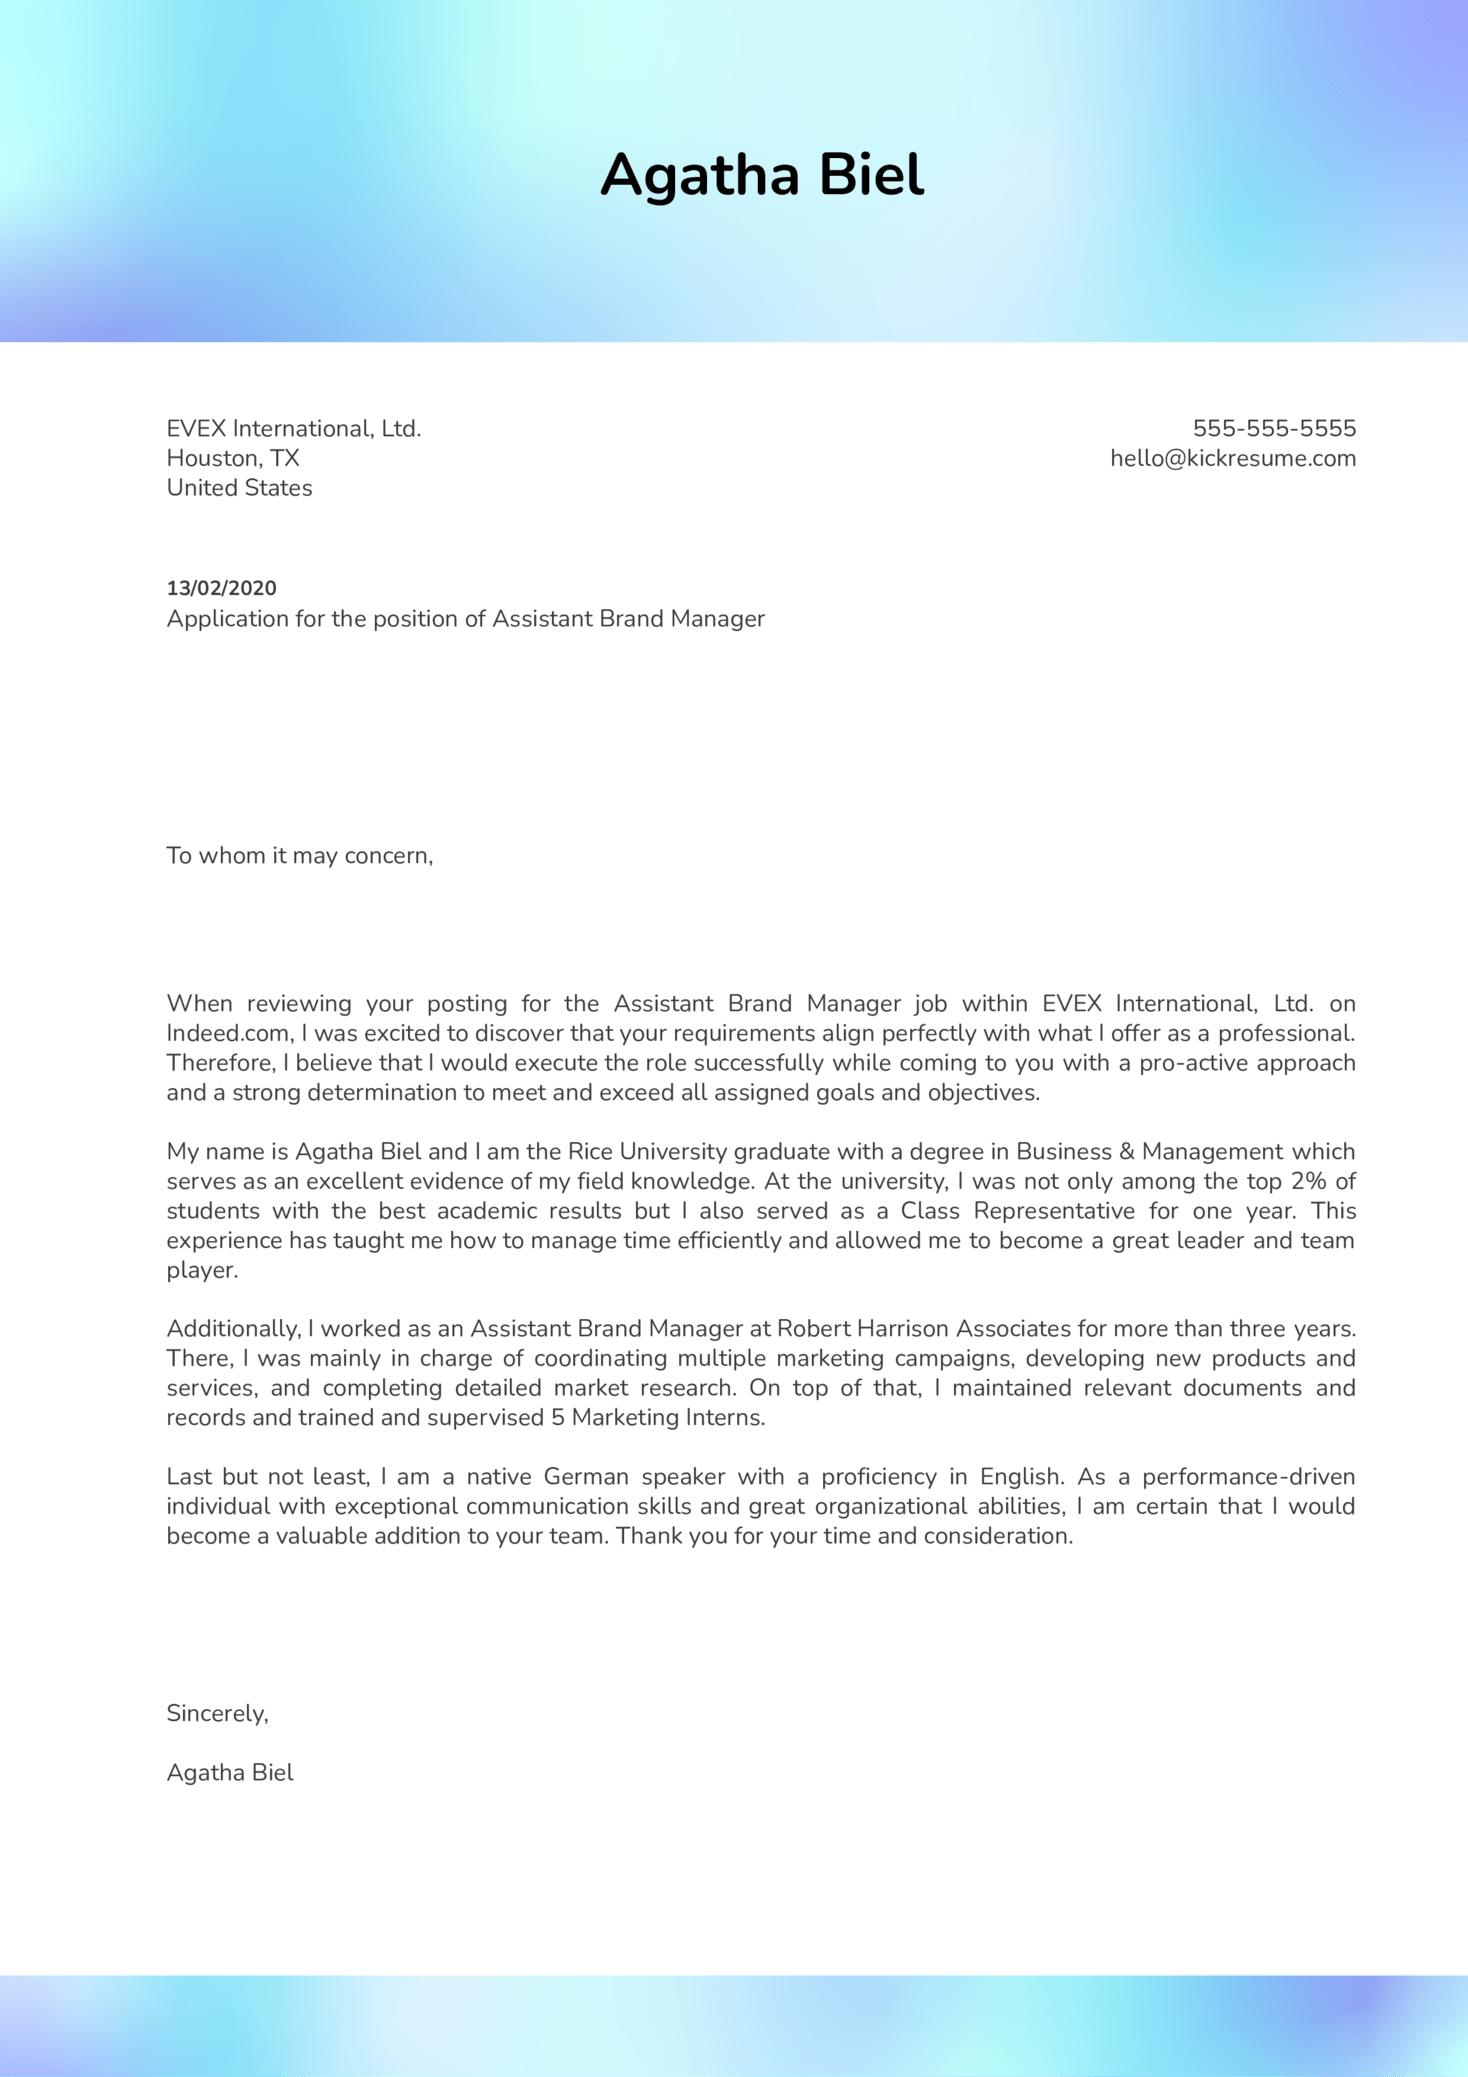 Assistant Brand Manager Cover Letter Sample Kickresume